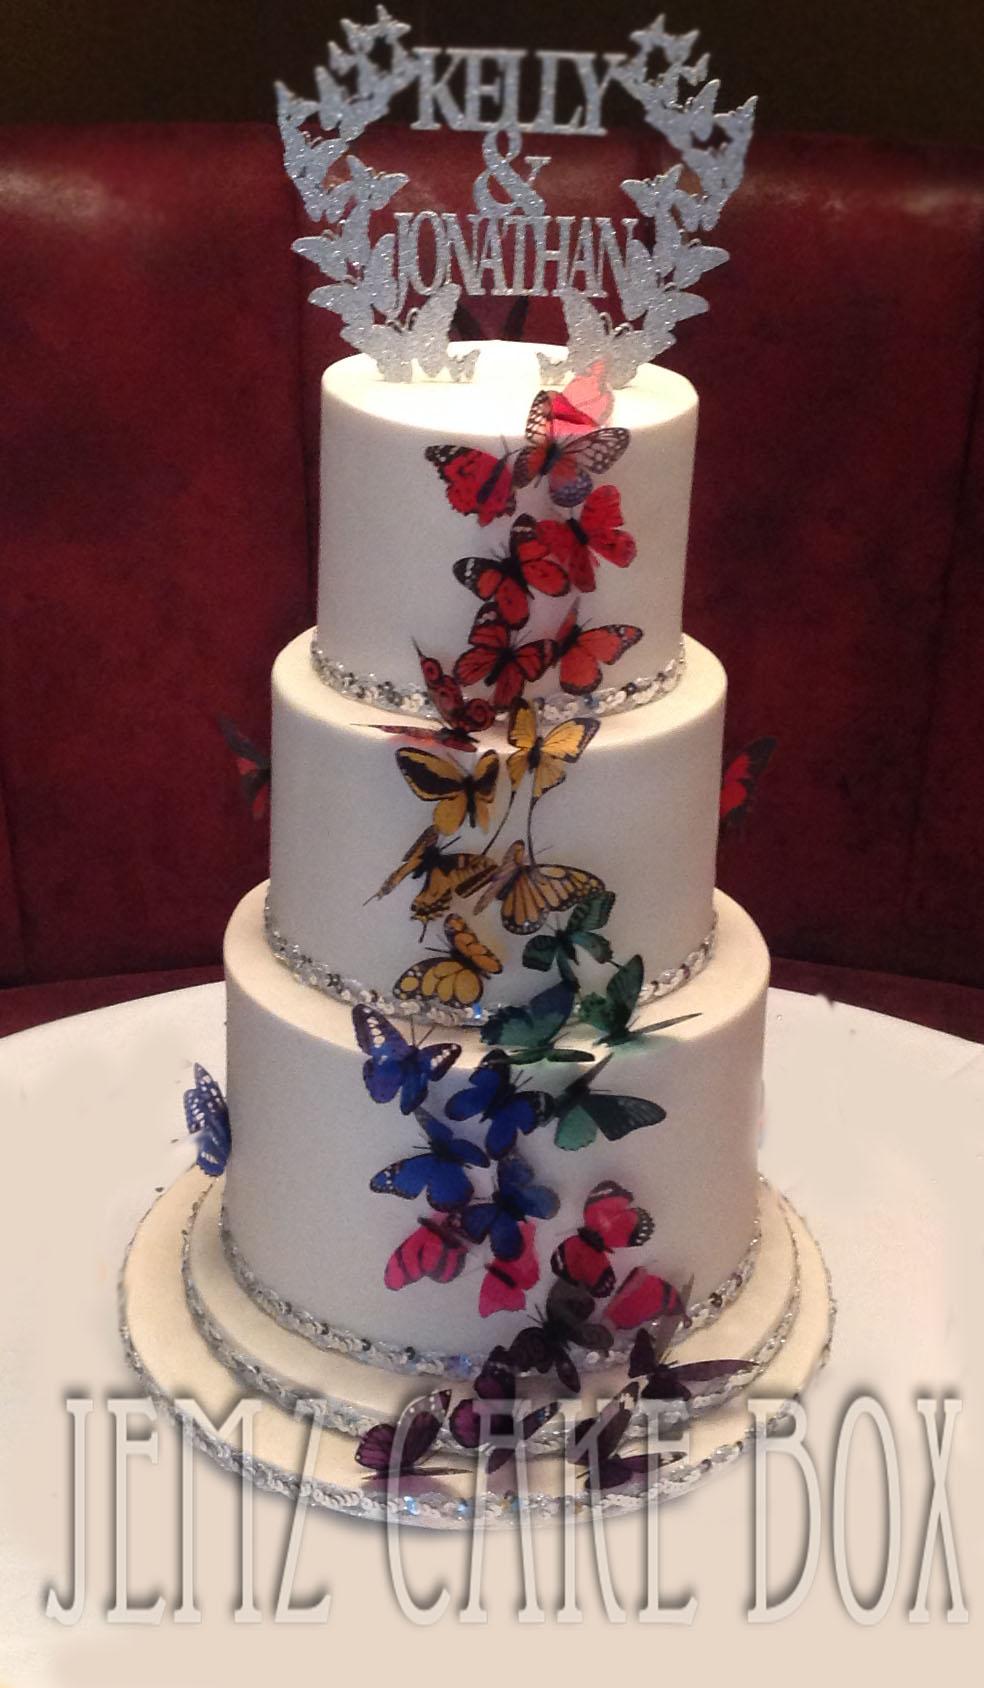 3 Tier Butterfly Wedding Cake 163 475 Jemz Cake Box3 Tier